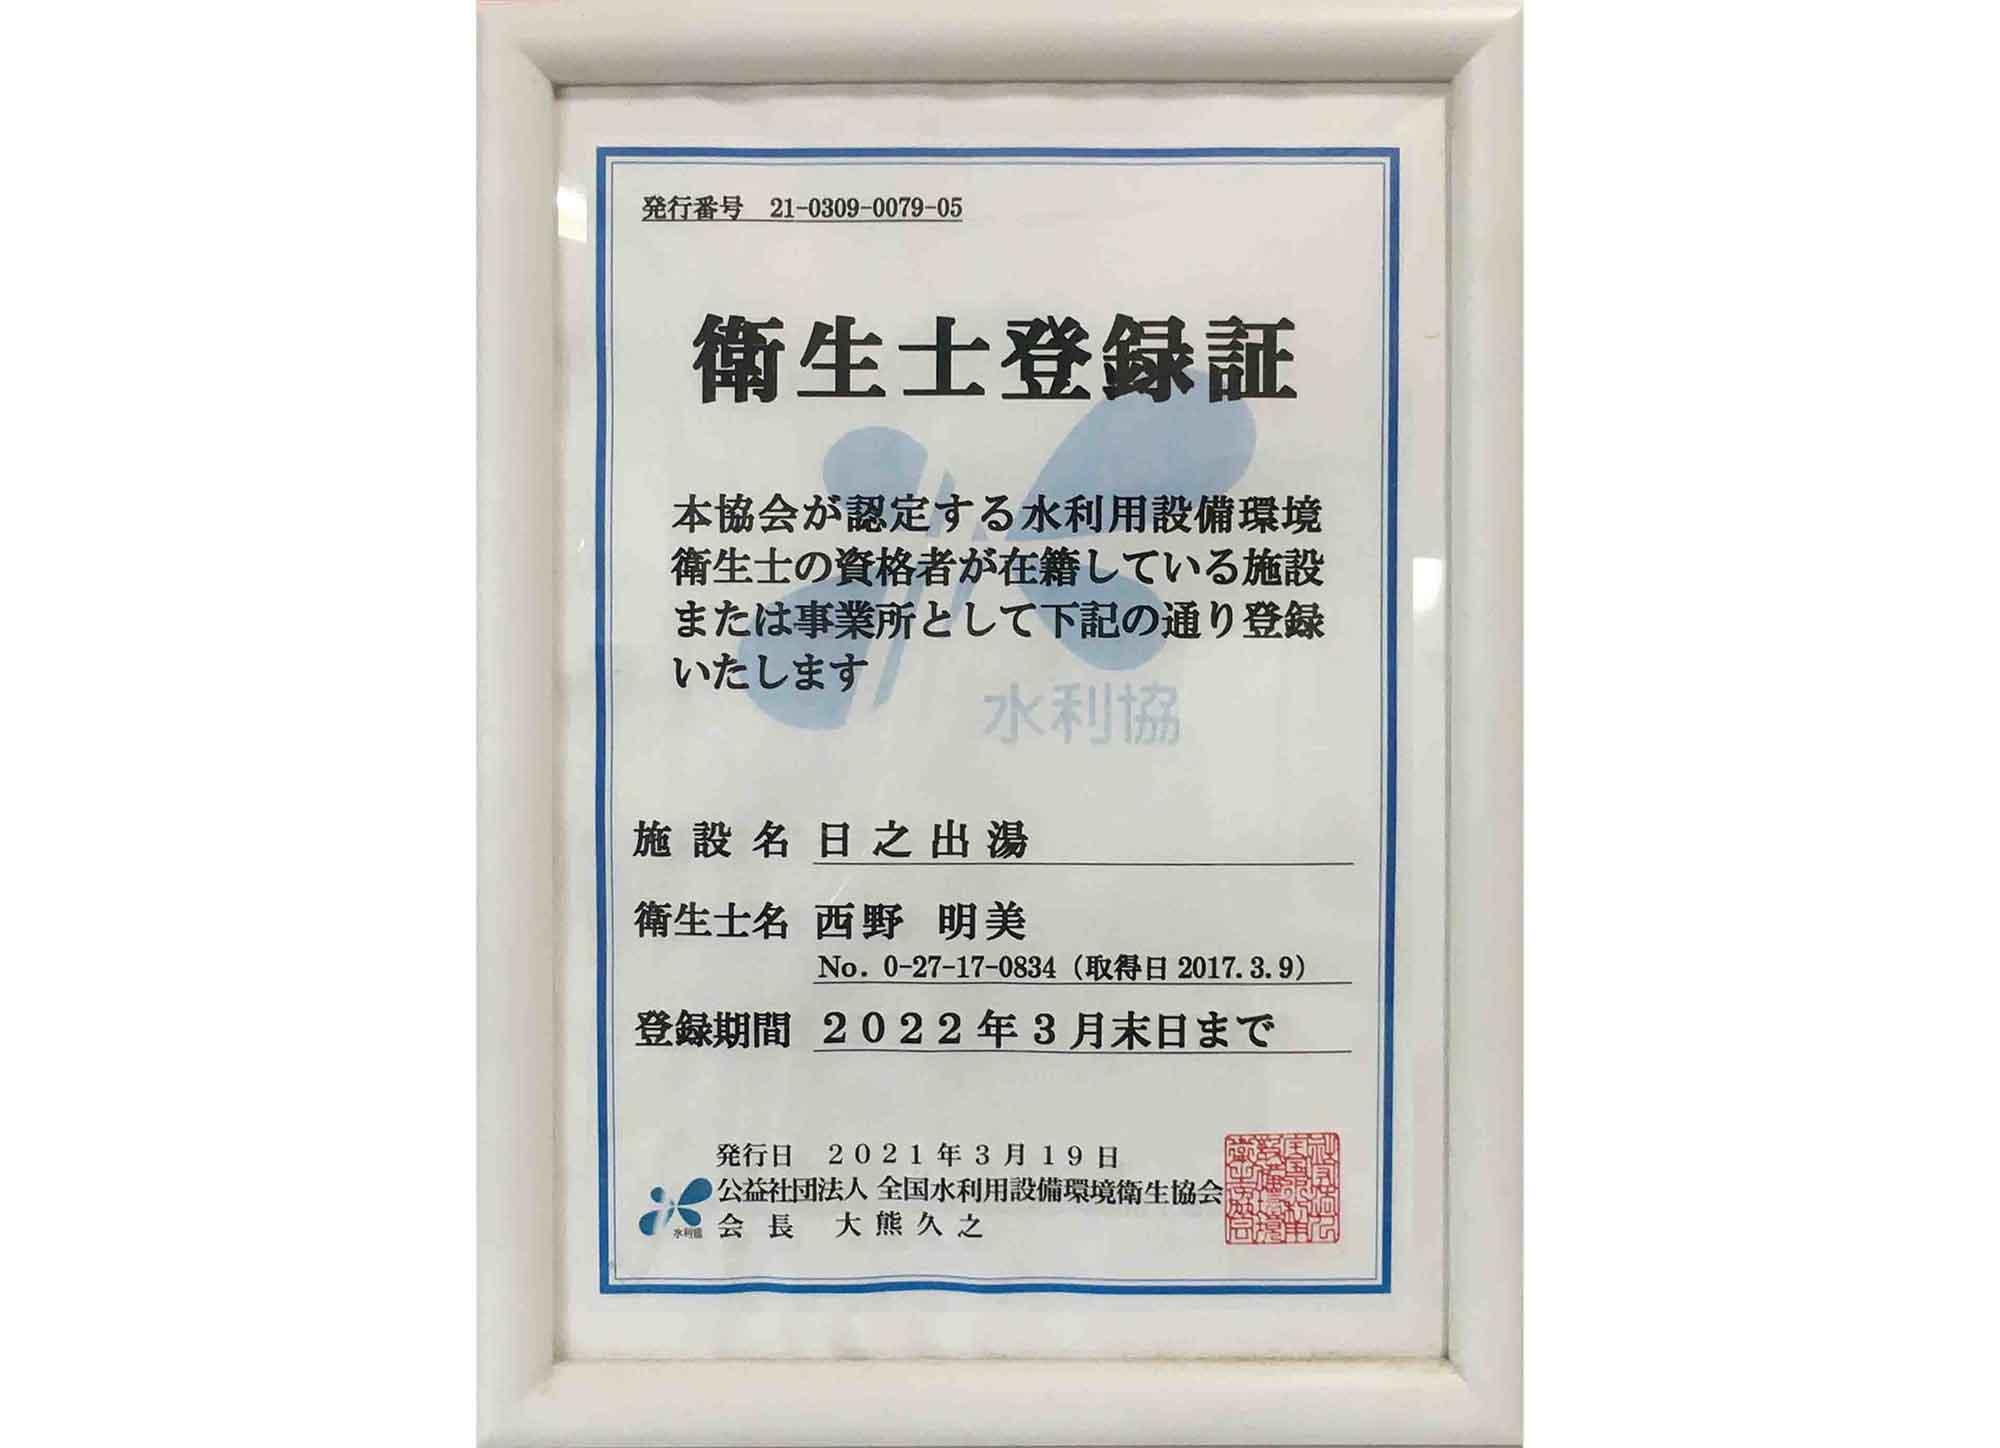 Hygienist-registration-certificate-2021